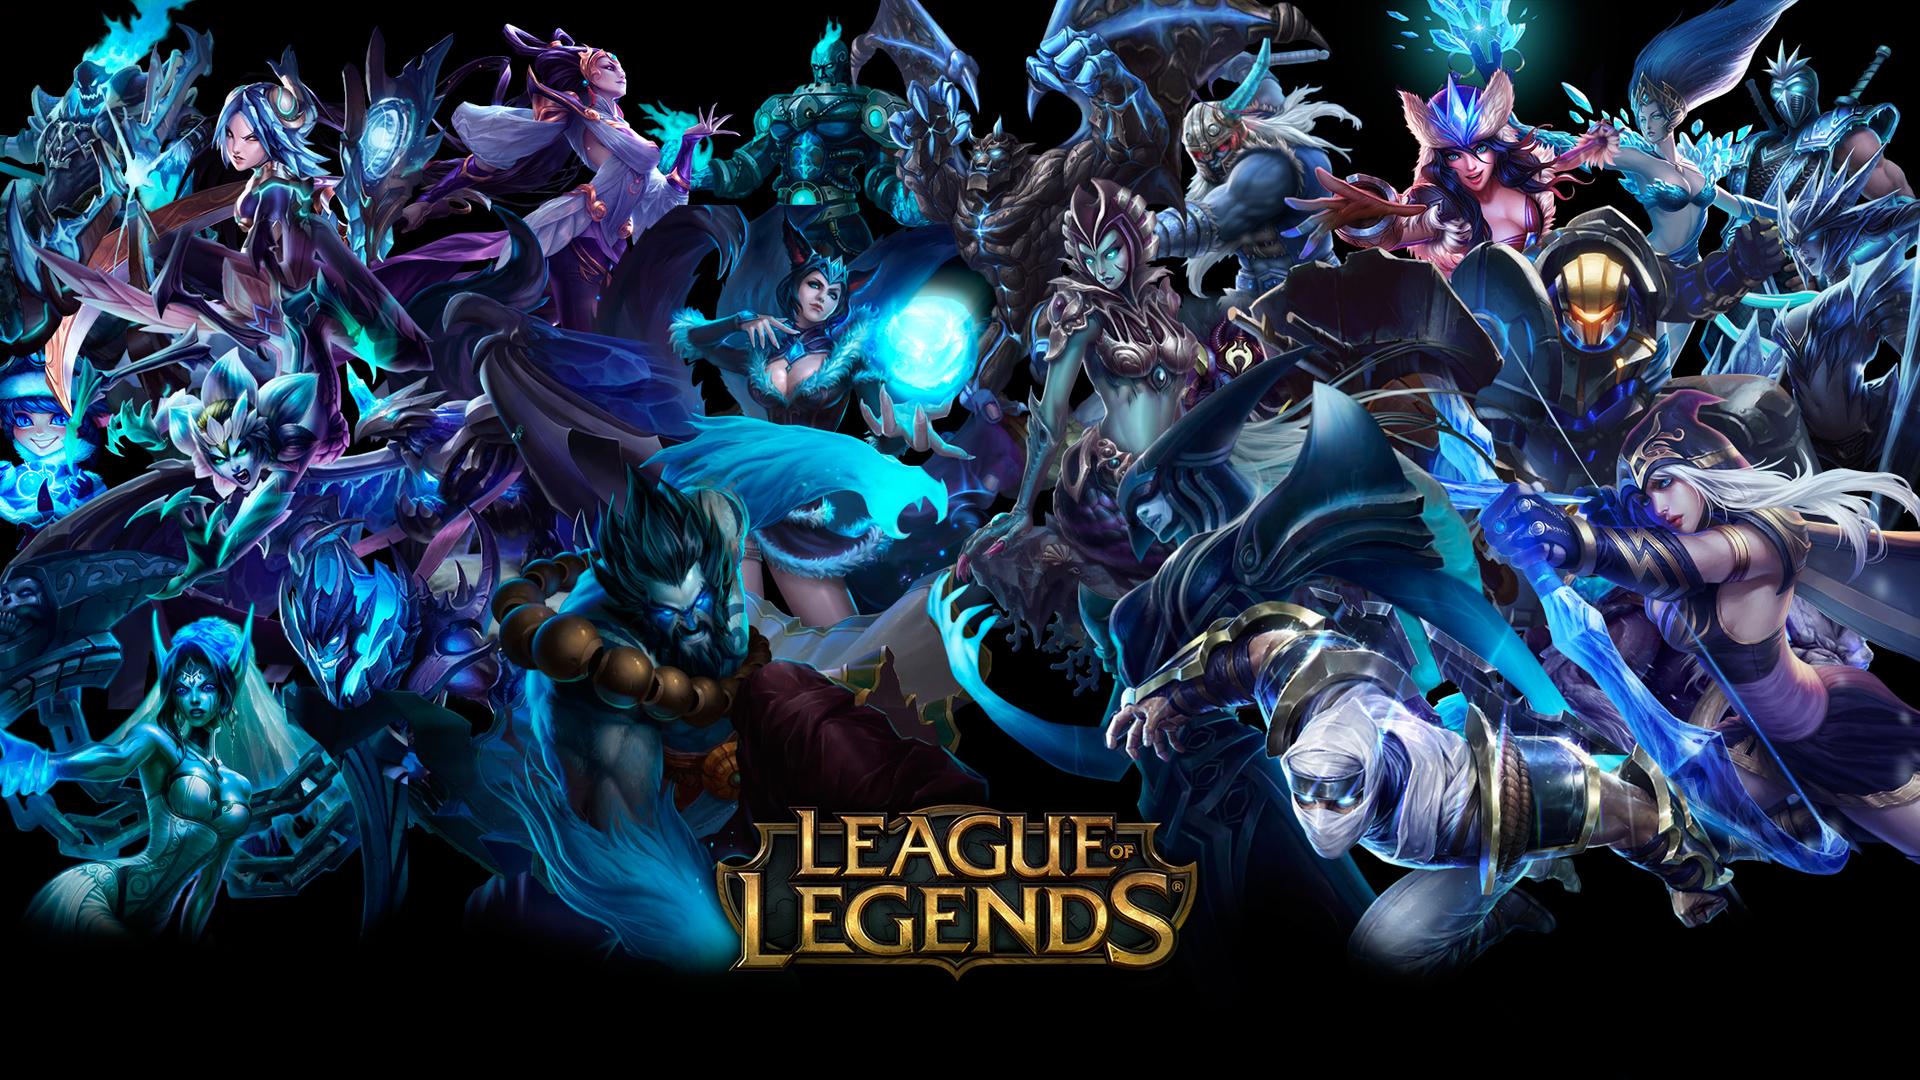 shyvana shen league of legends hd wallpaper lol champion 1920x1200 1m 1920x1080